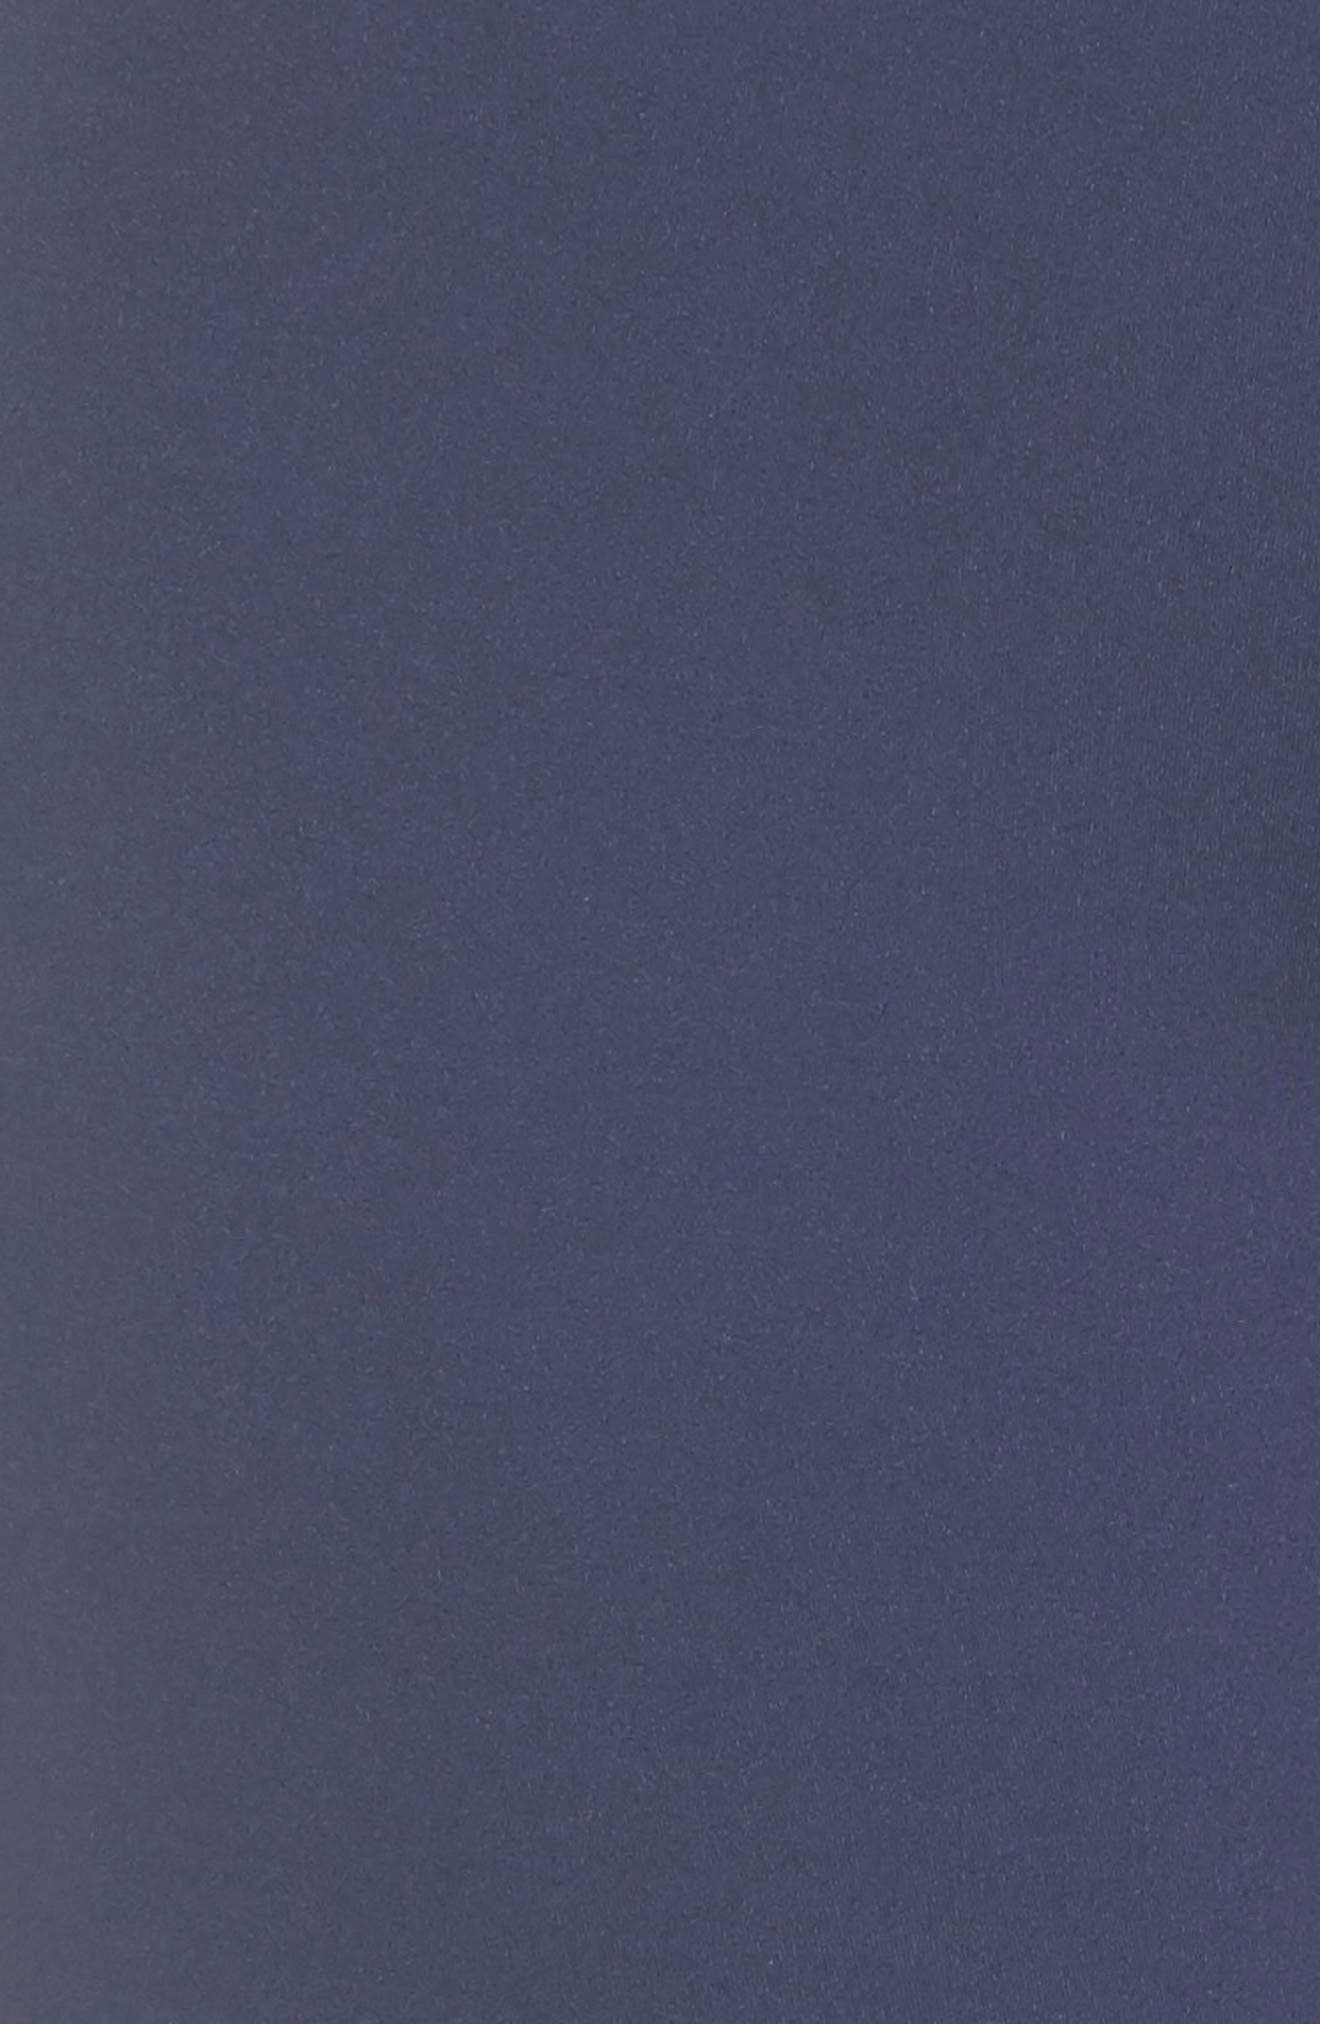 Gaines High Waist Leggings,                             Alternate thumbnail 8, color,                             Navy